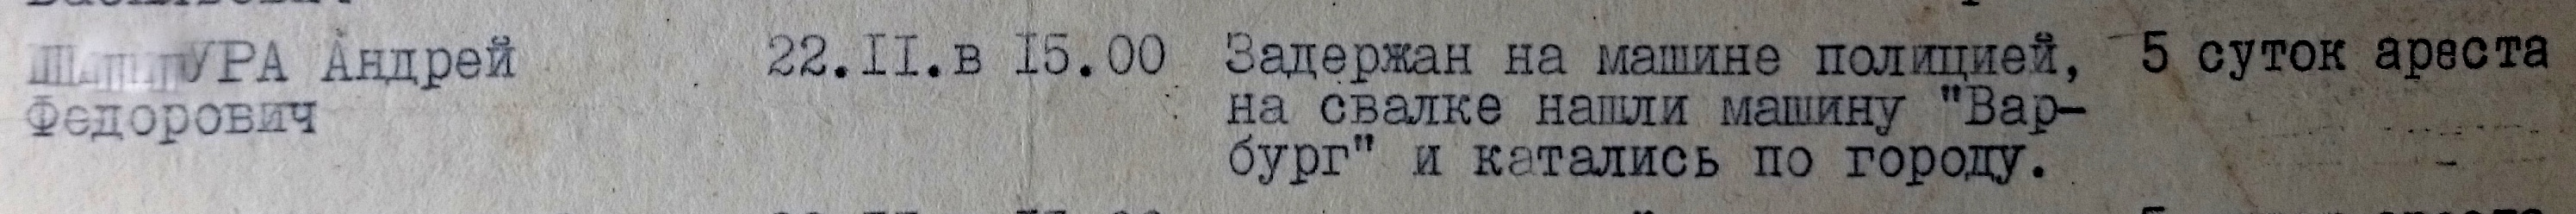 http://s7.uploads.ru/P6hFb.jpg